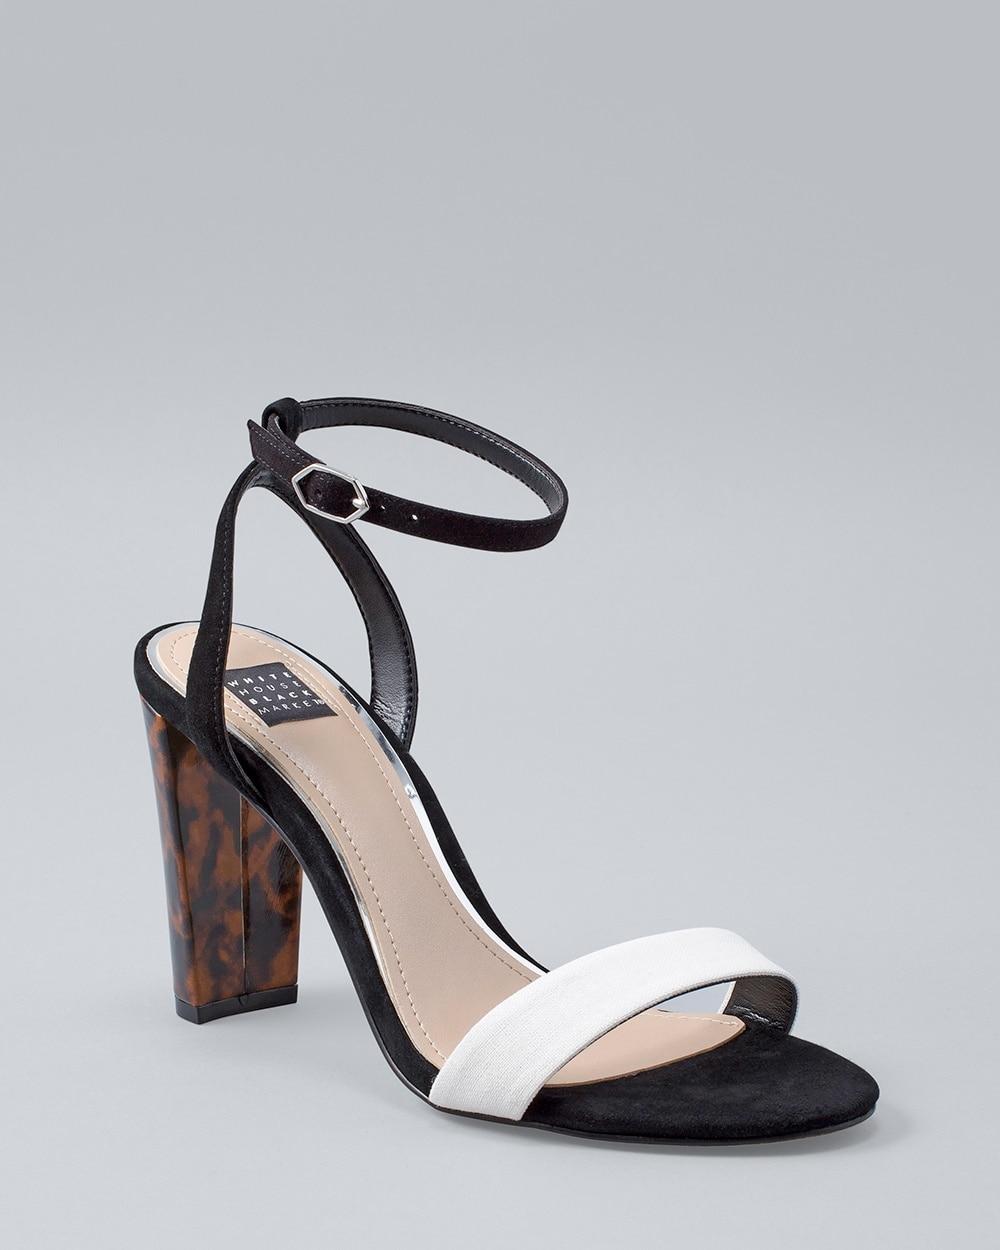 Colorblock High-Heel Sandals - White